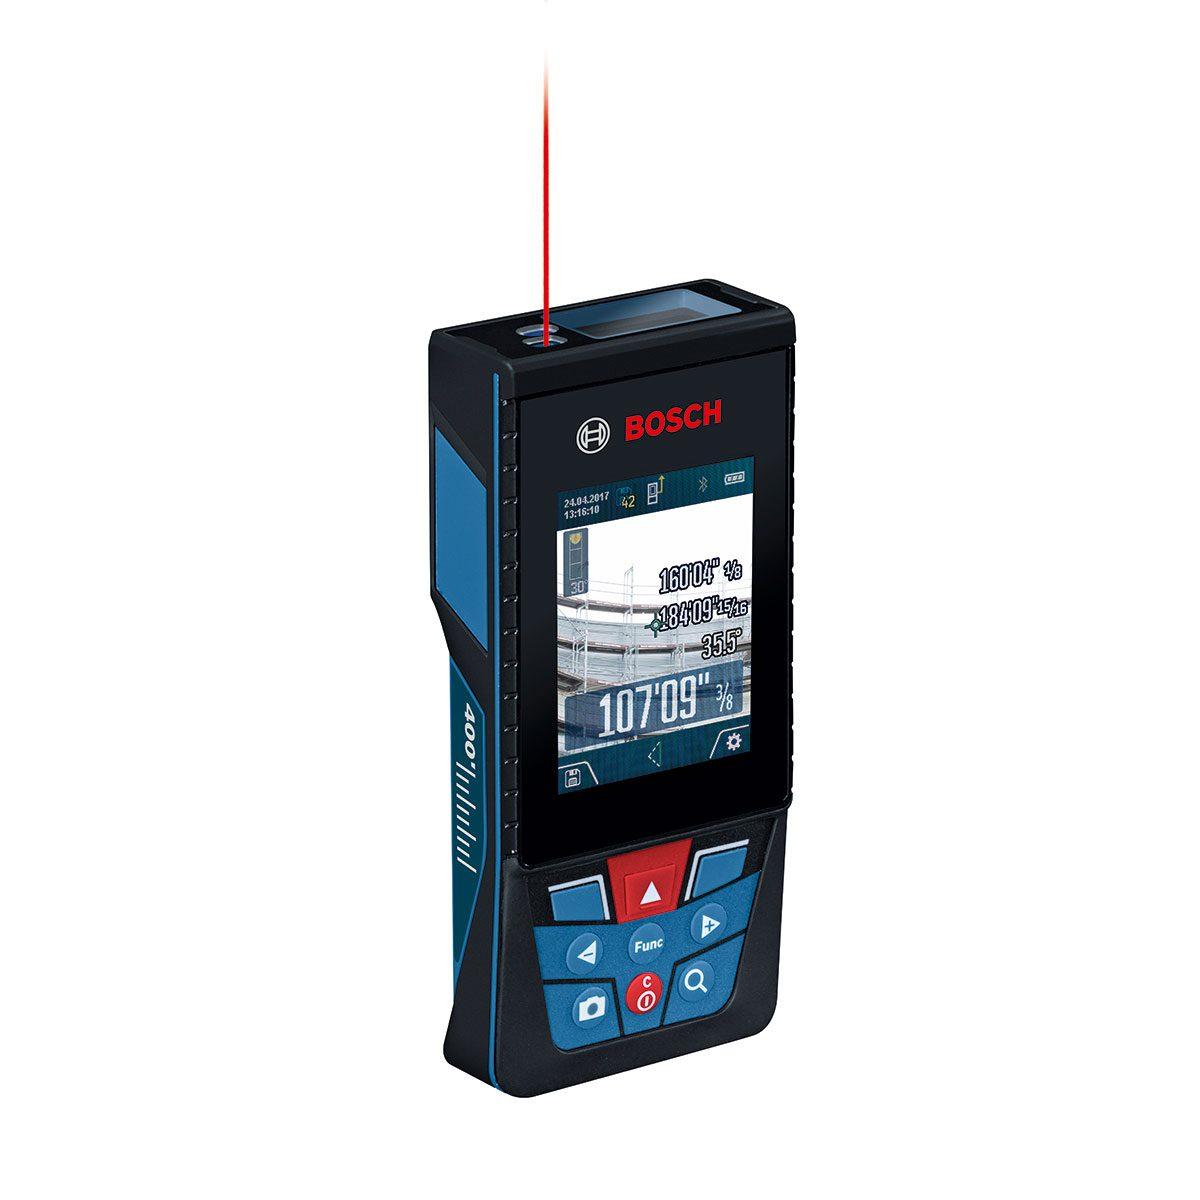 A Bosch Laser Measurer | Construction Pro Tips